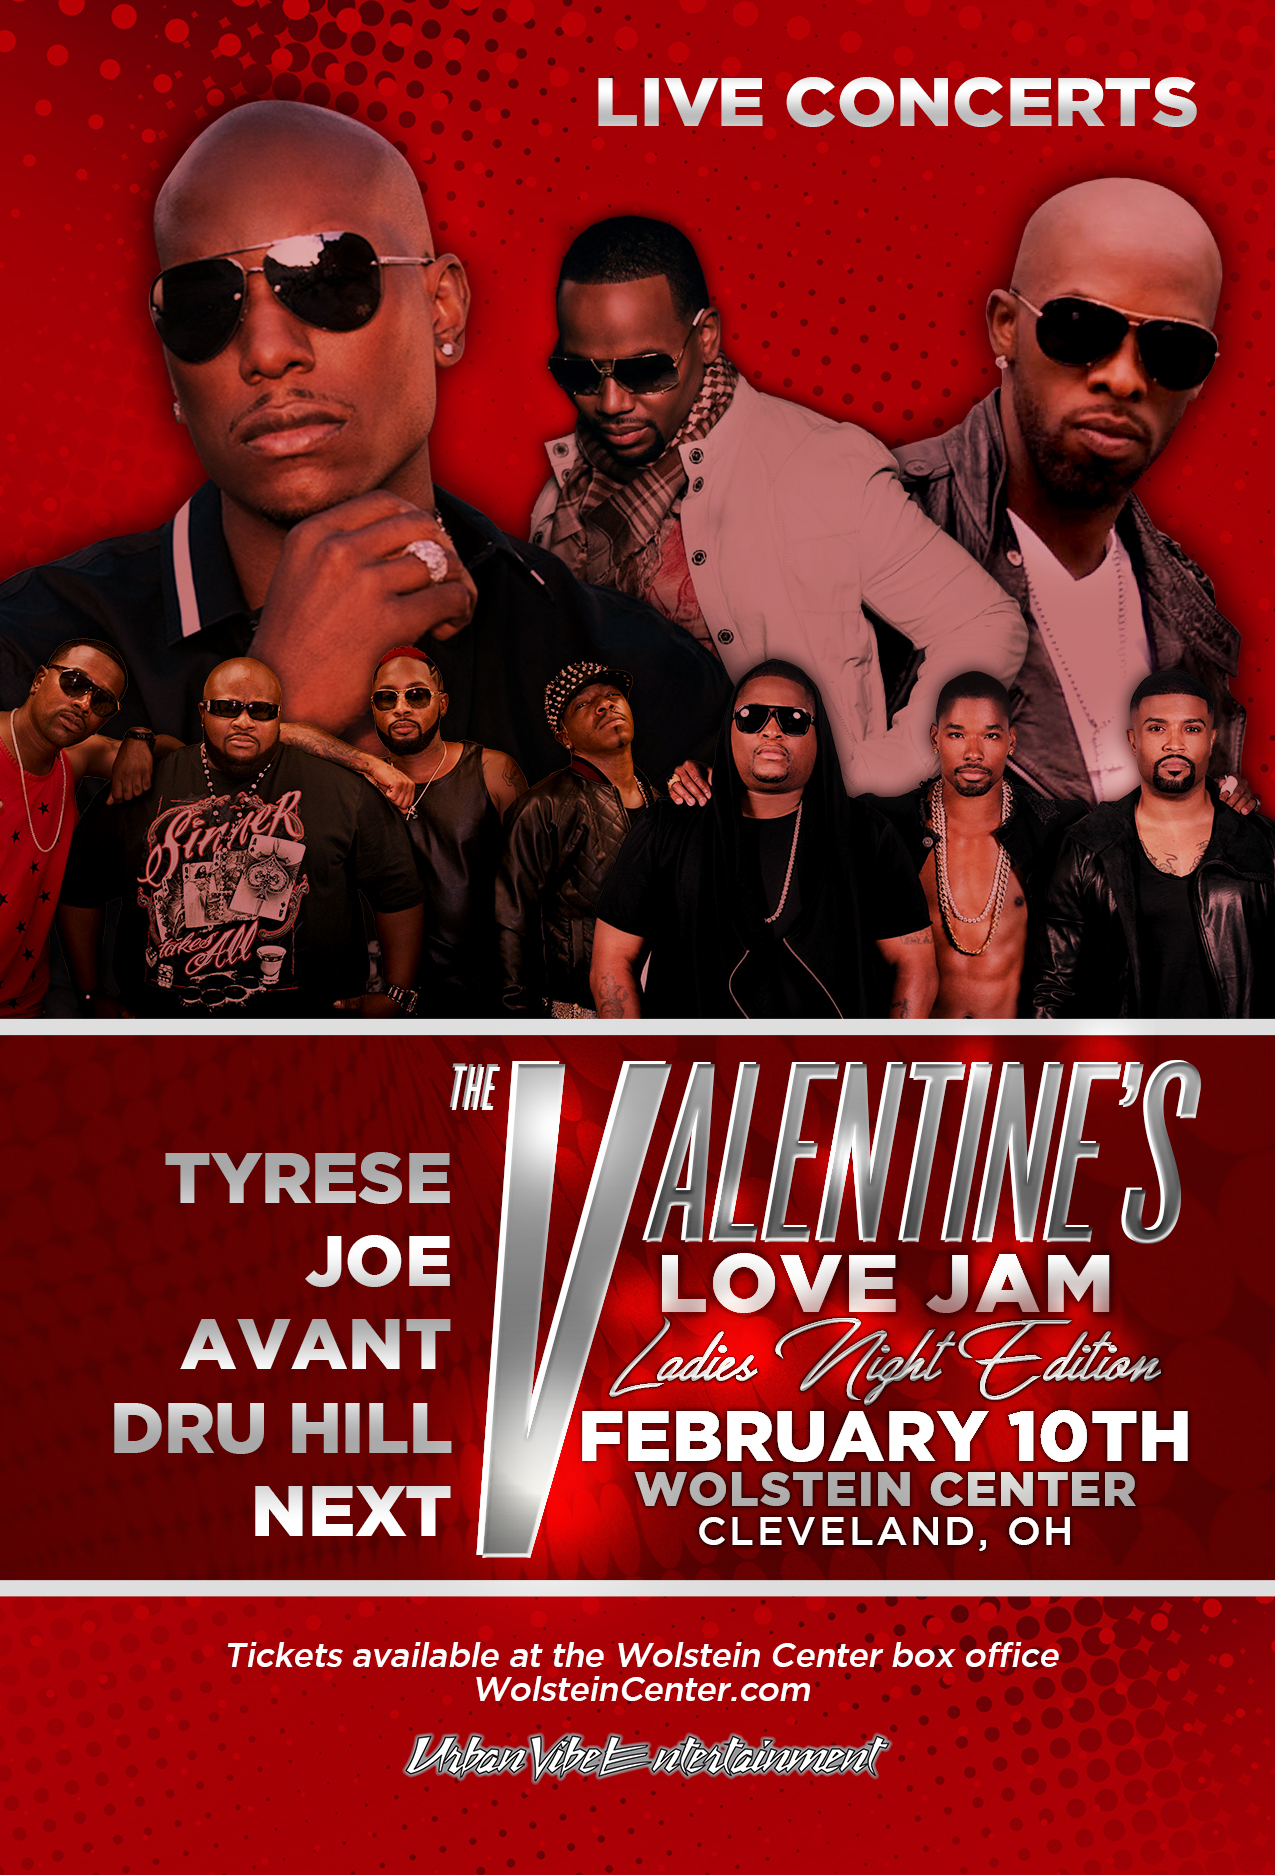 Valentine's Day Love Jam